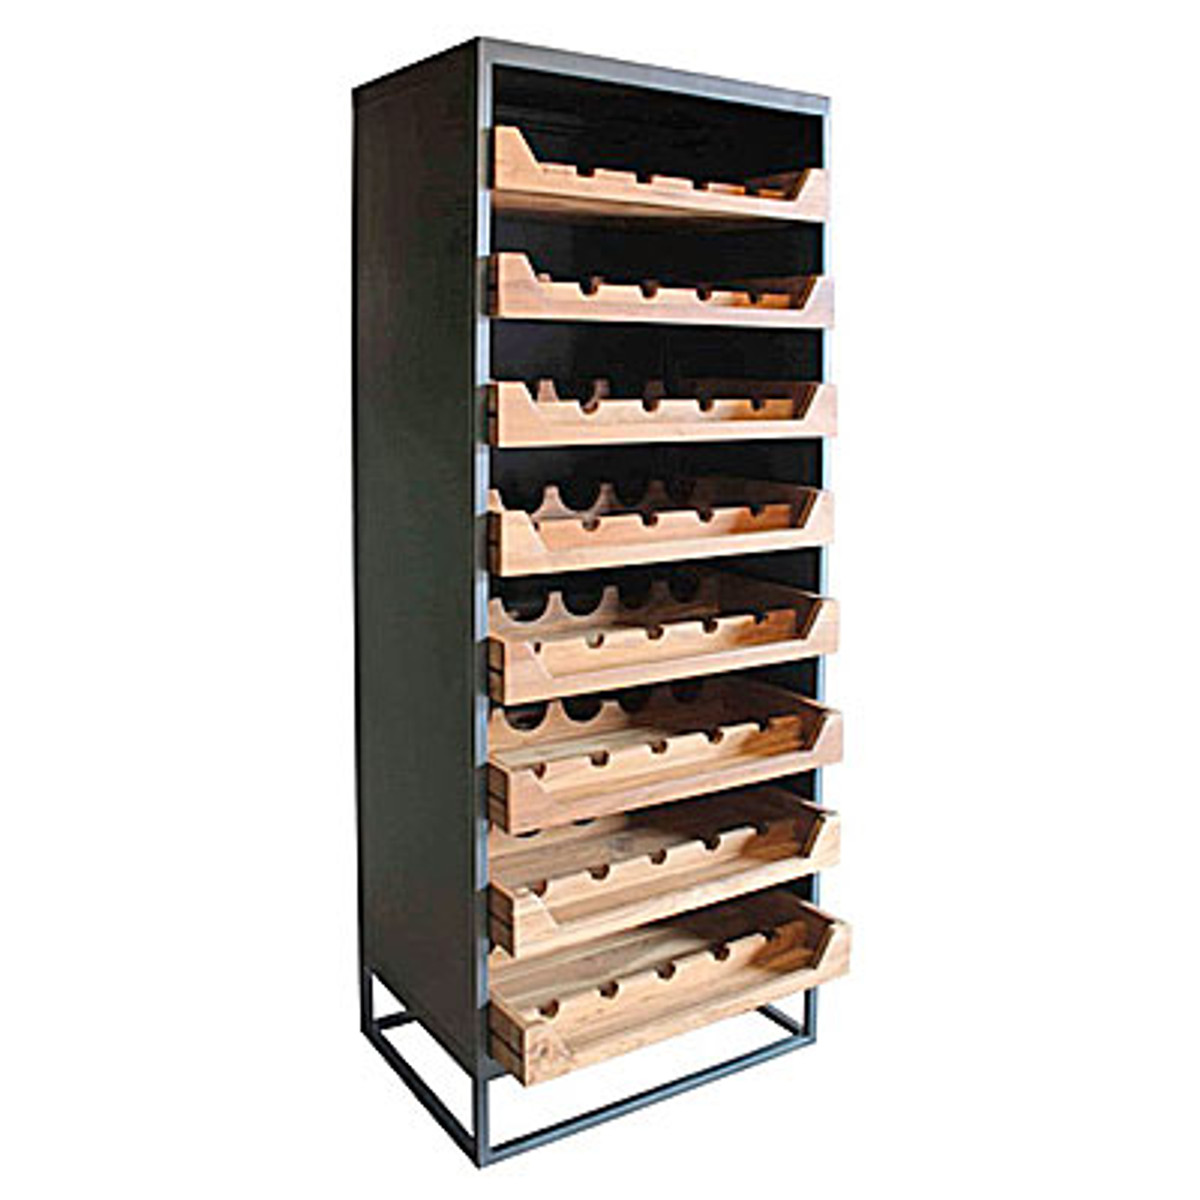 Casa Padrino Industrial Look Weinschrank 67x45x183cm Metall Holz Weinregal Barockgrosshandel De